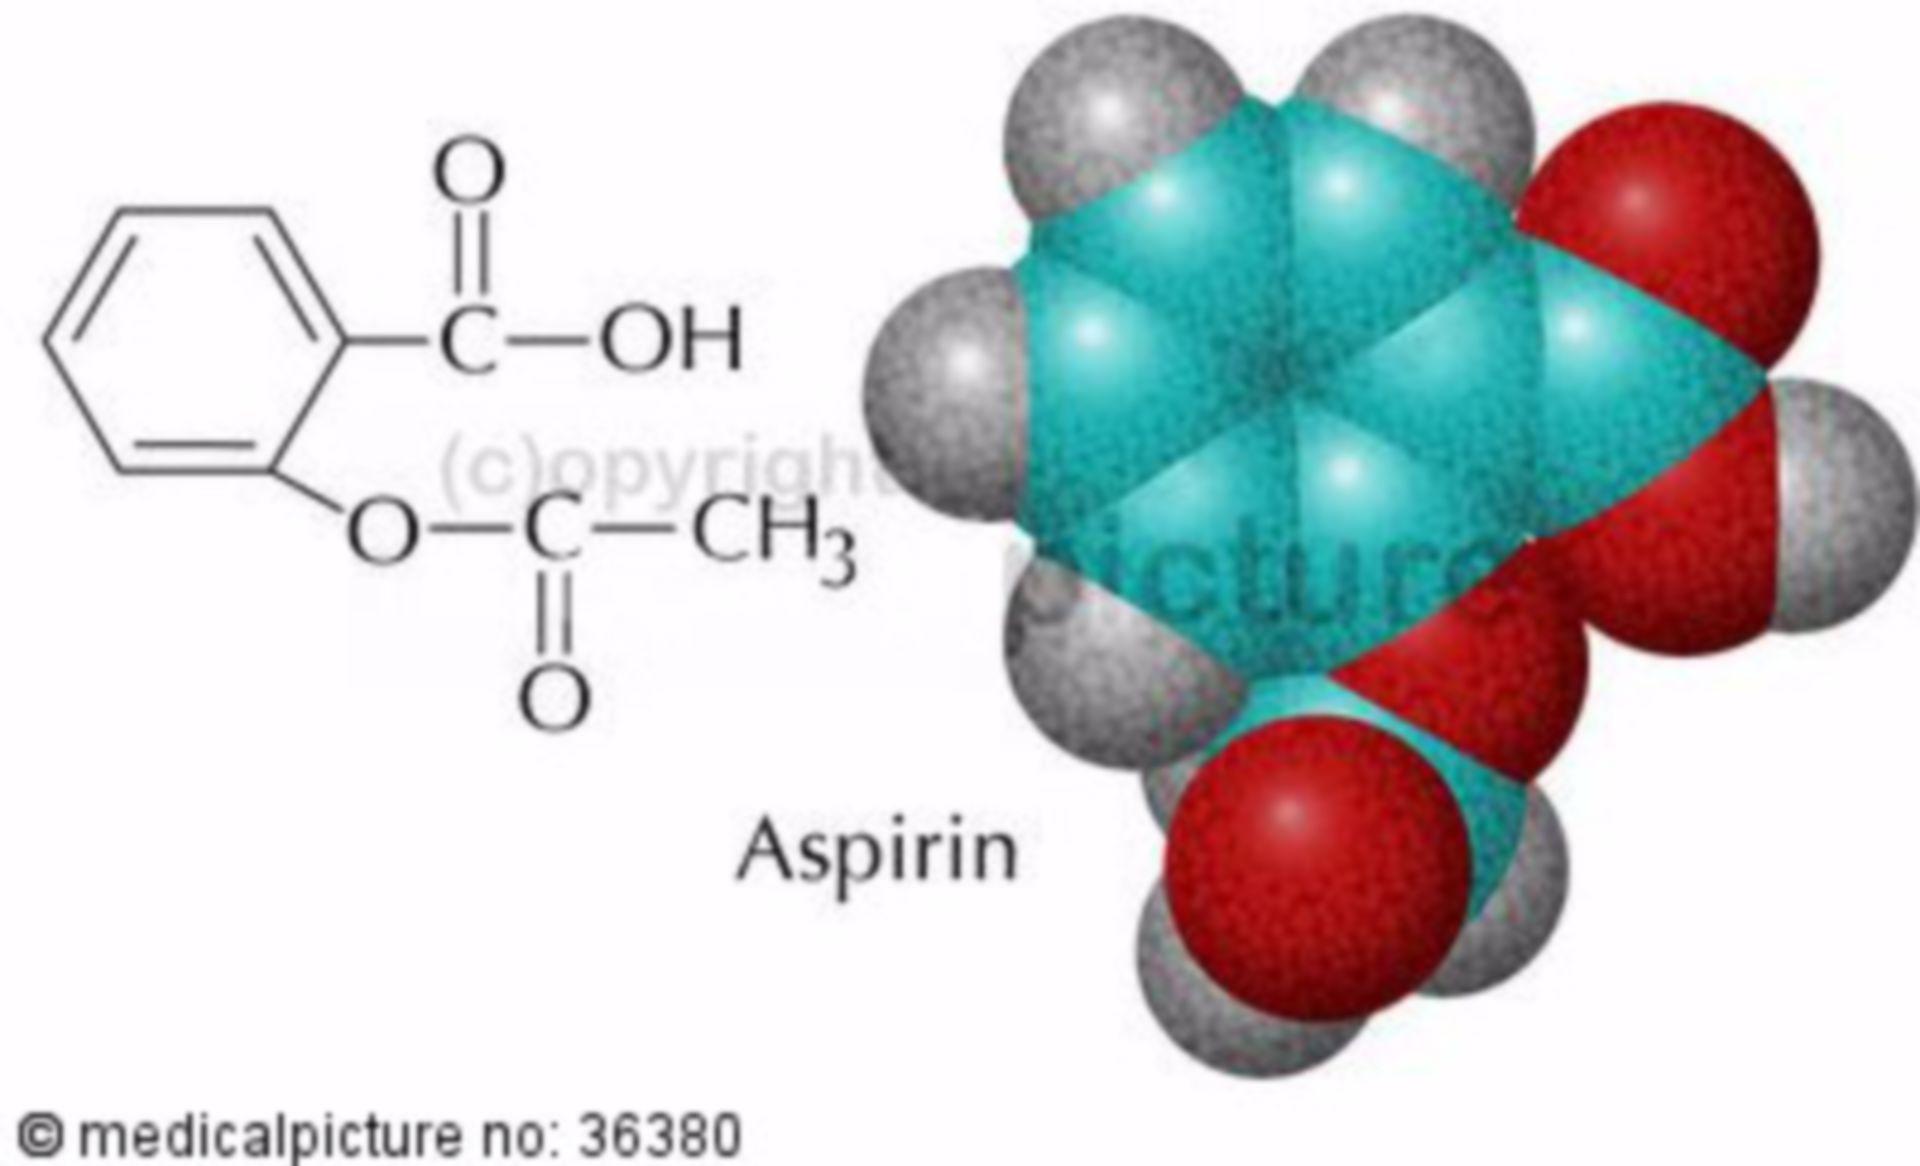 Aspirin, molecular structure